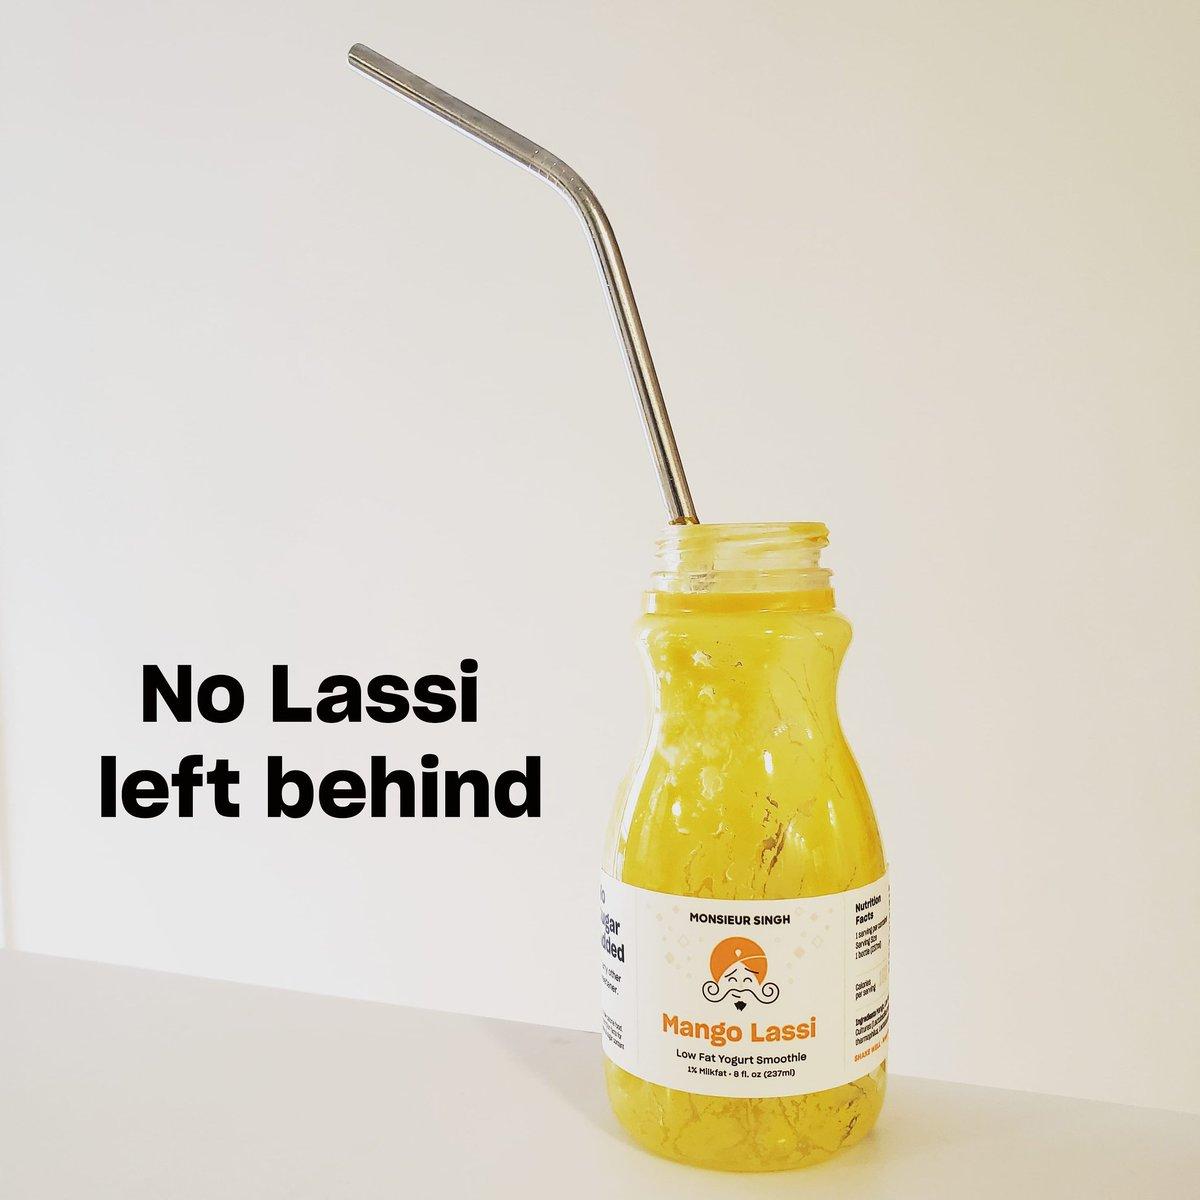 All powered up for #Monday with a very very tasty Mango Lassi with no added sugar  #MondayMorning #MondayMood #MondayVibes #MondayRush #MondayBoost #lassi #mangolassi #singh #nosugar #nosugaradded #healthylifestyle #tastyandhealthy #monsieursingh #monsieursinghlassi #Mango